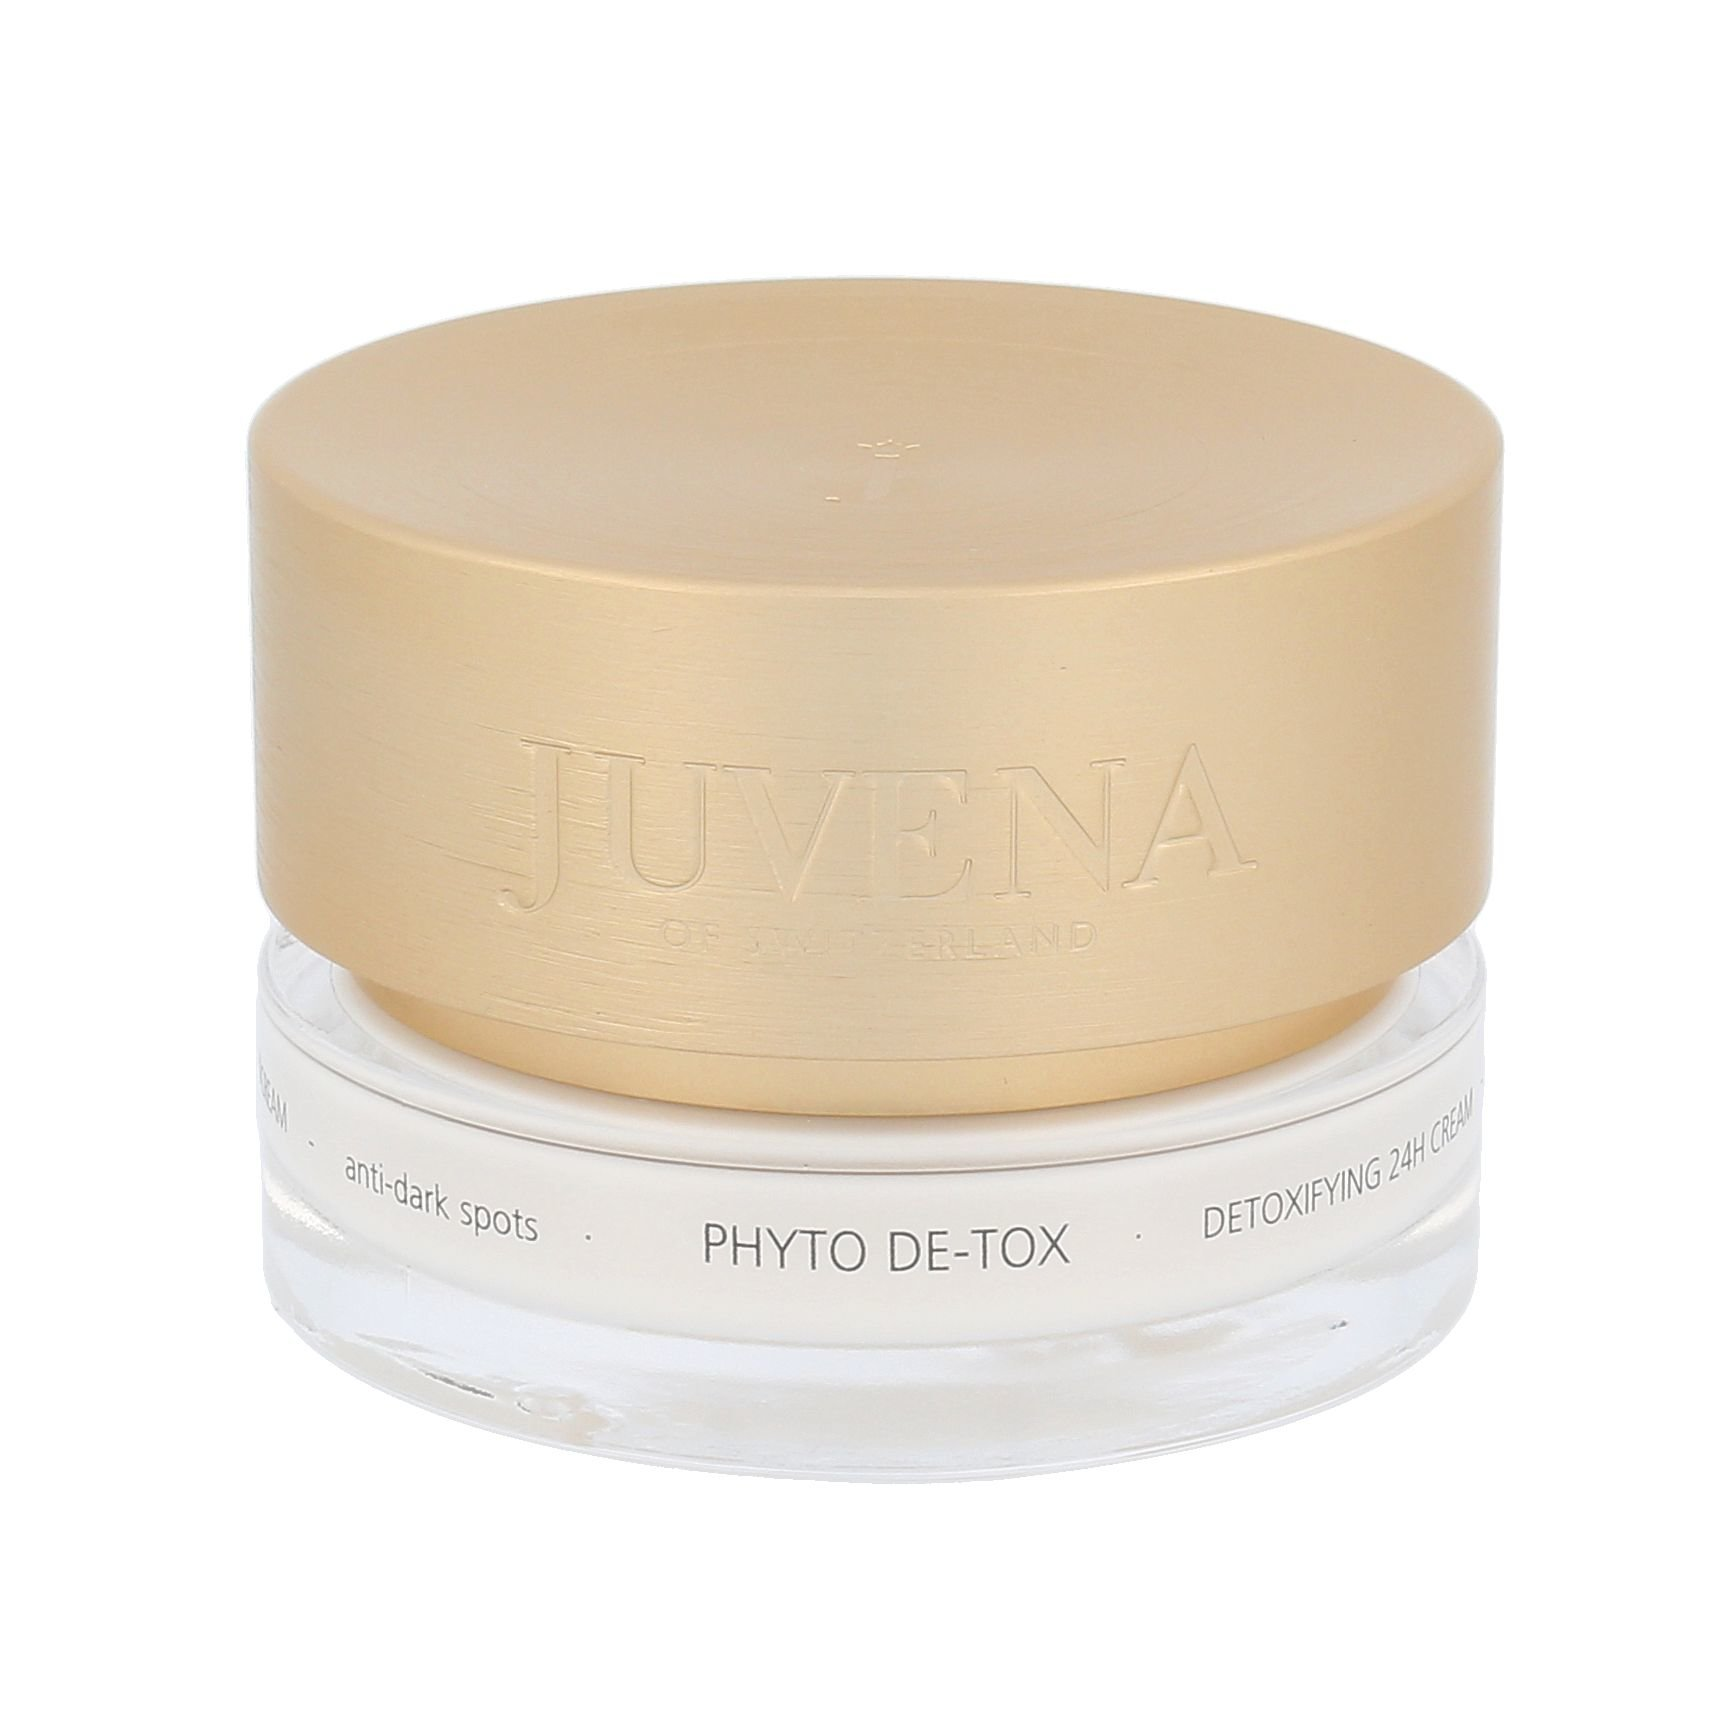 Juvena Phyto De-Tox Day Cream 50ml